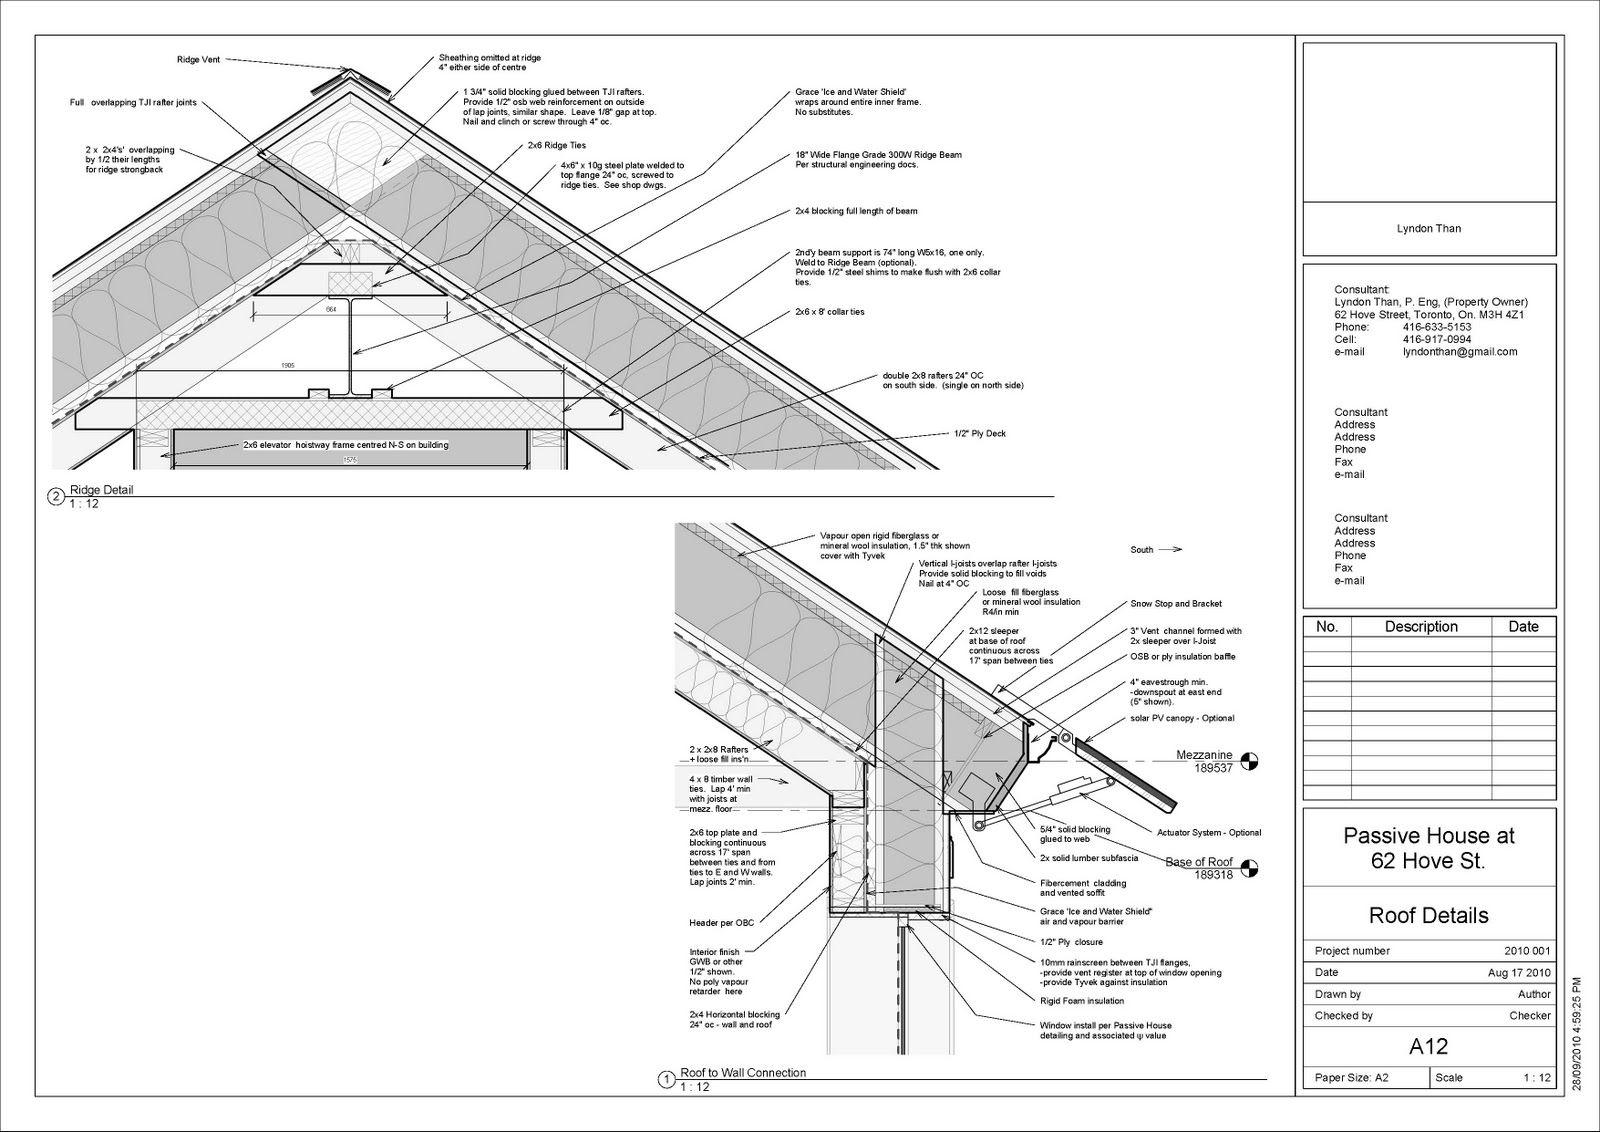 Passive House Roof Details